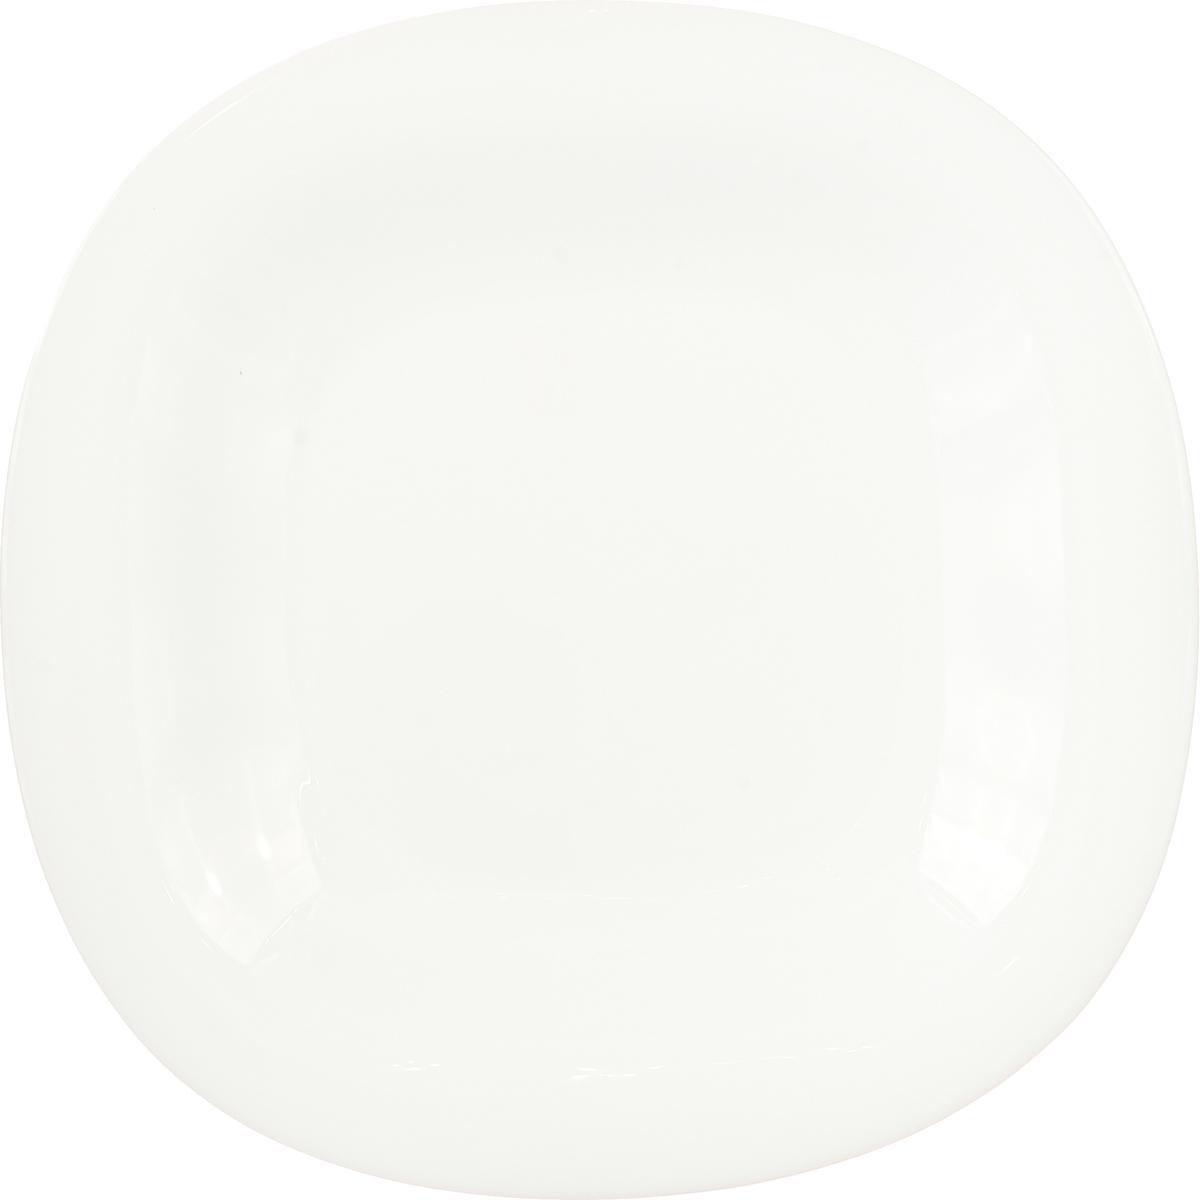 Тарелка Luminarc Нью Карин, H5604, белый, диаметр 26 см набор столовой посуды luminarc нью карин n2955 белый черный